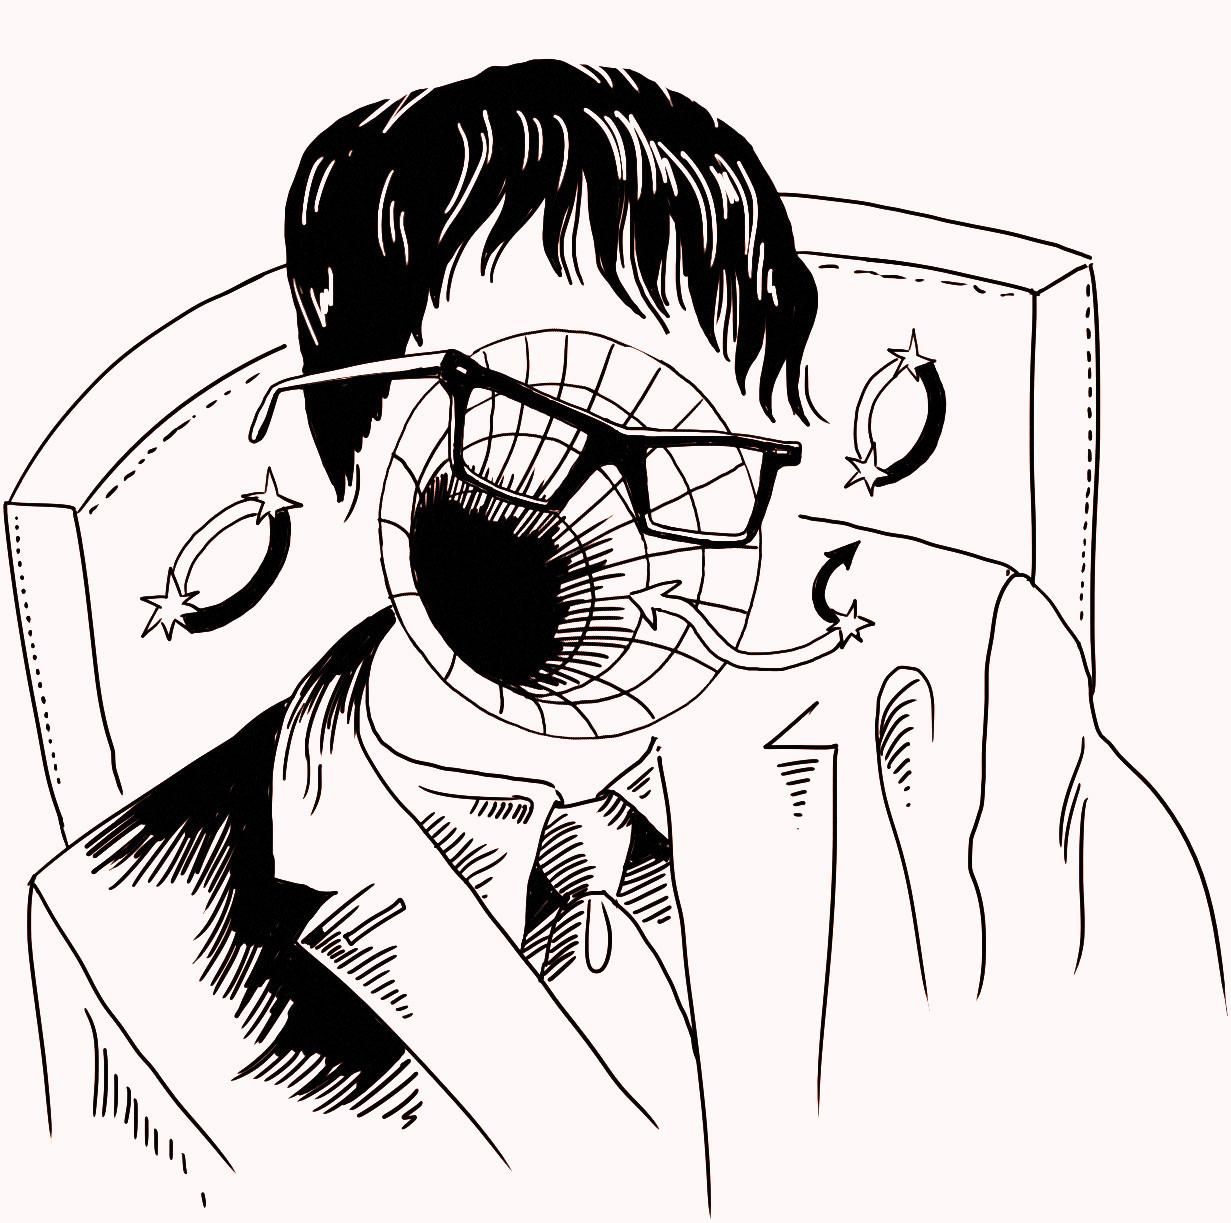 Blackholes_Hawking